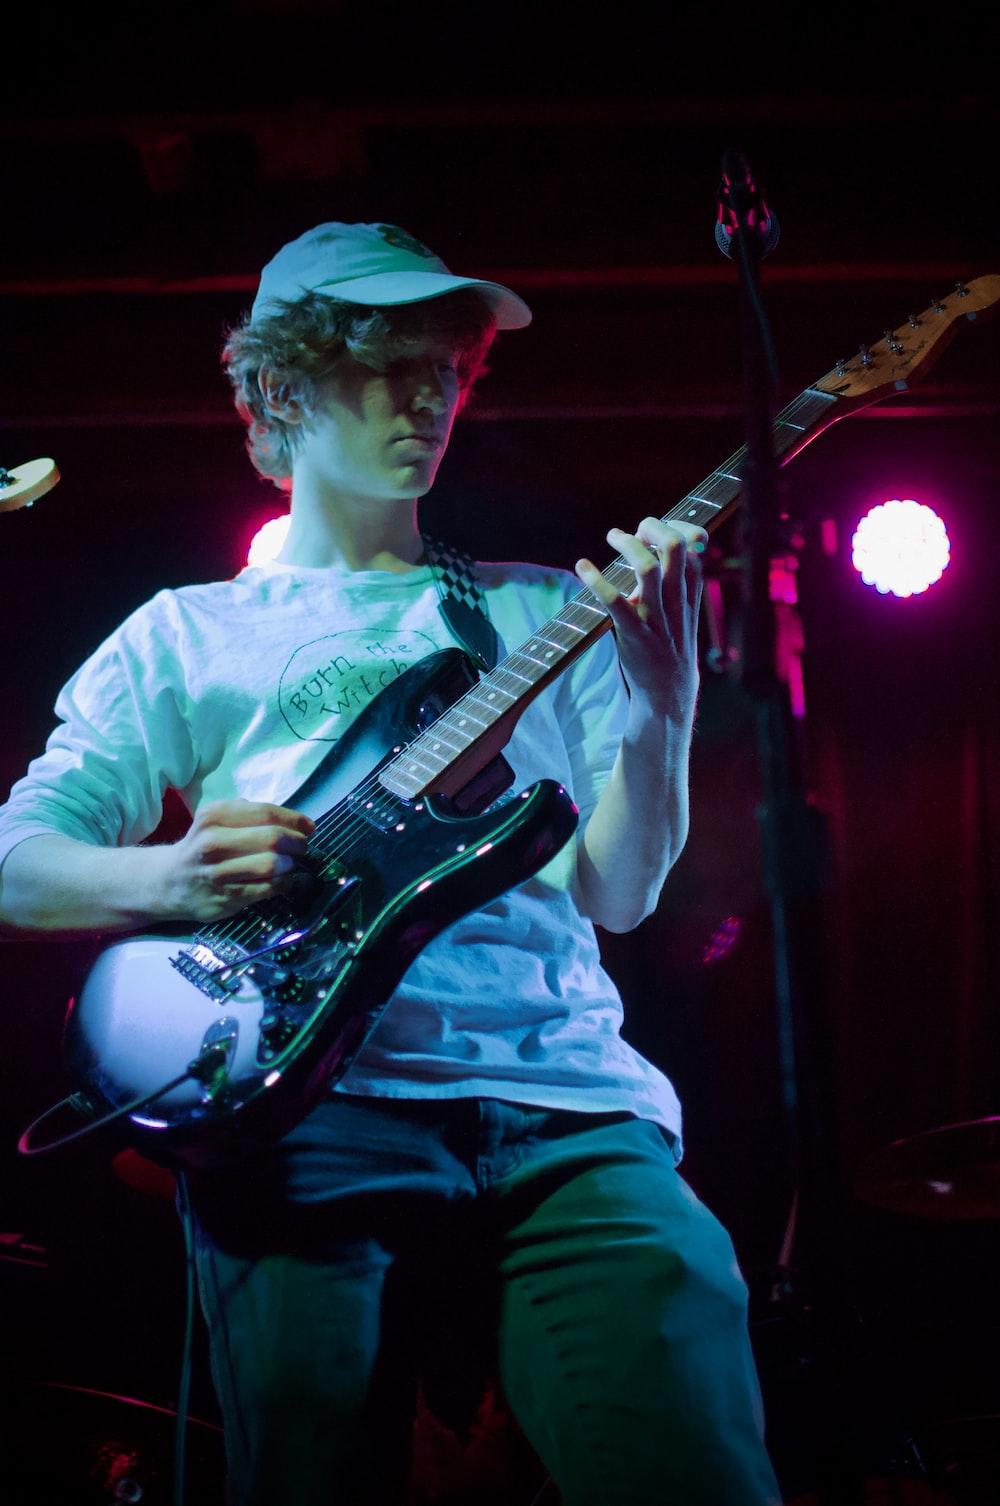 man in white dress shirt playing electric guitar